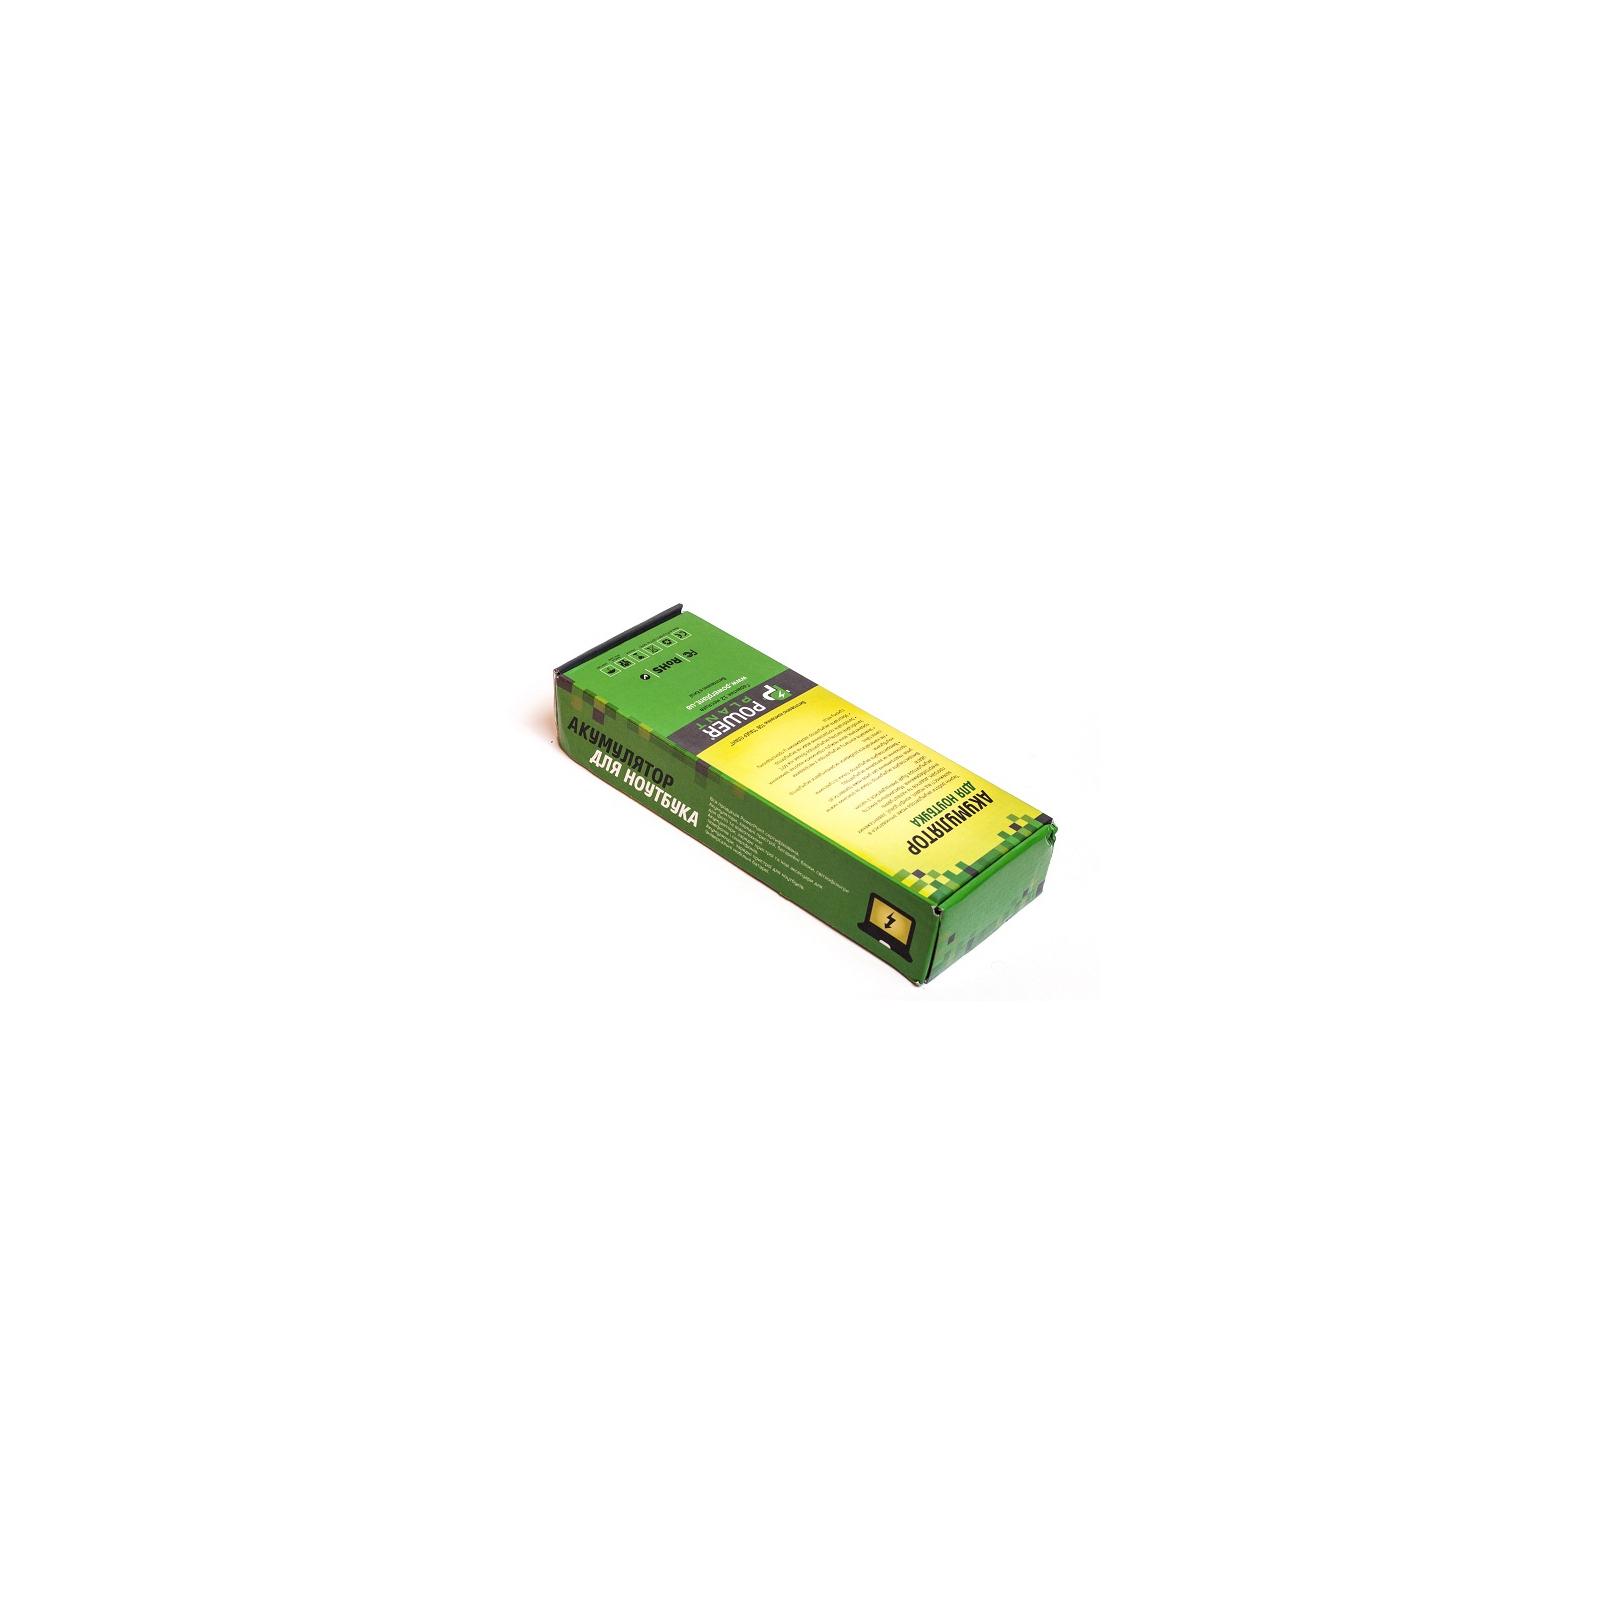 Аккумулятор для ноутбука DELL Inspiron 6000 (D5318, DL5319LP) 11.1V6600mAh PowerPlant (NB00000115) изображение 2